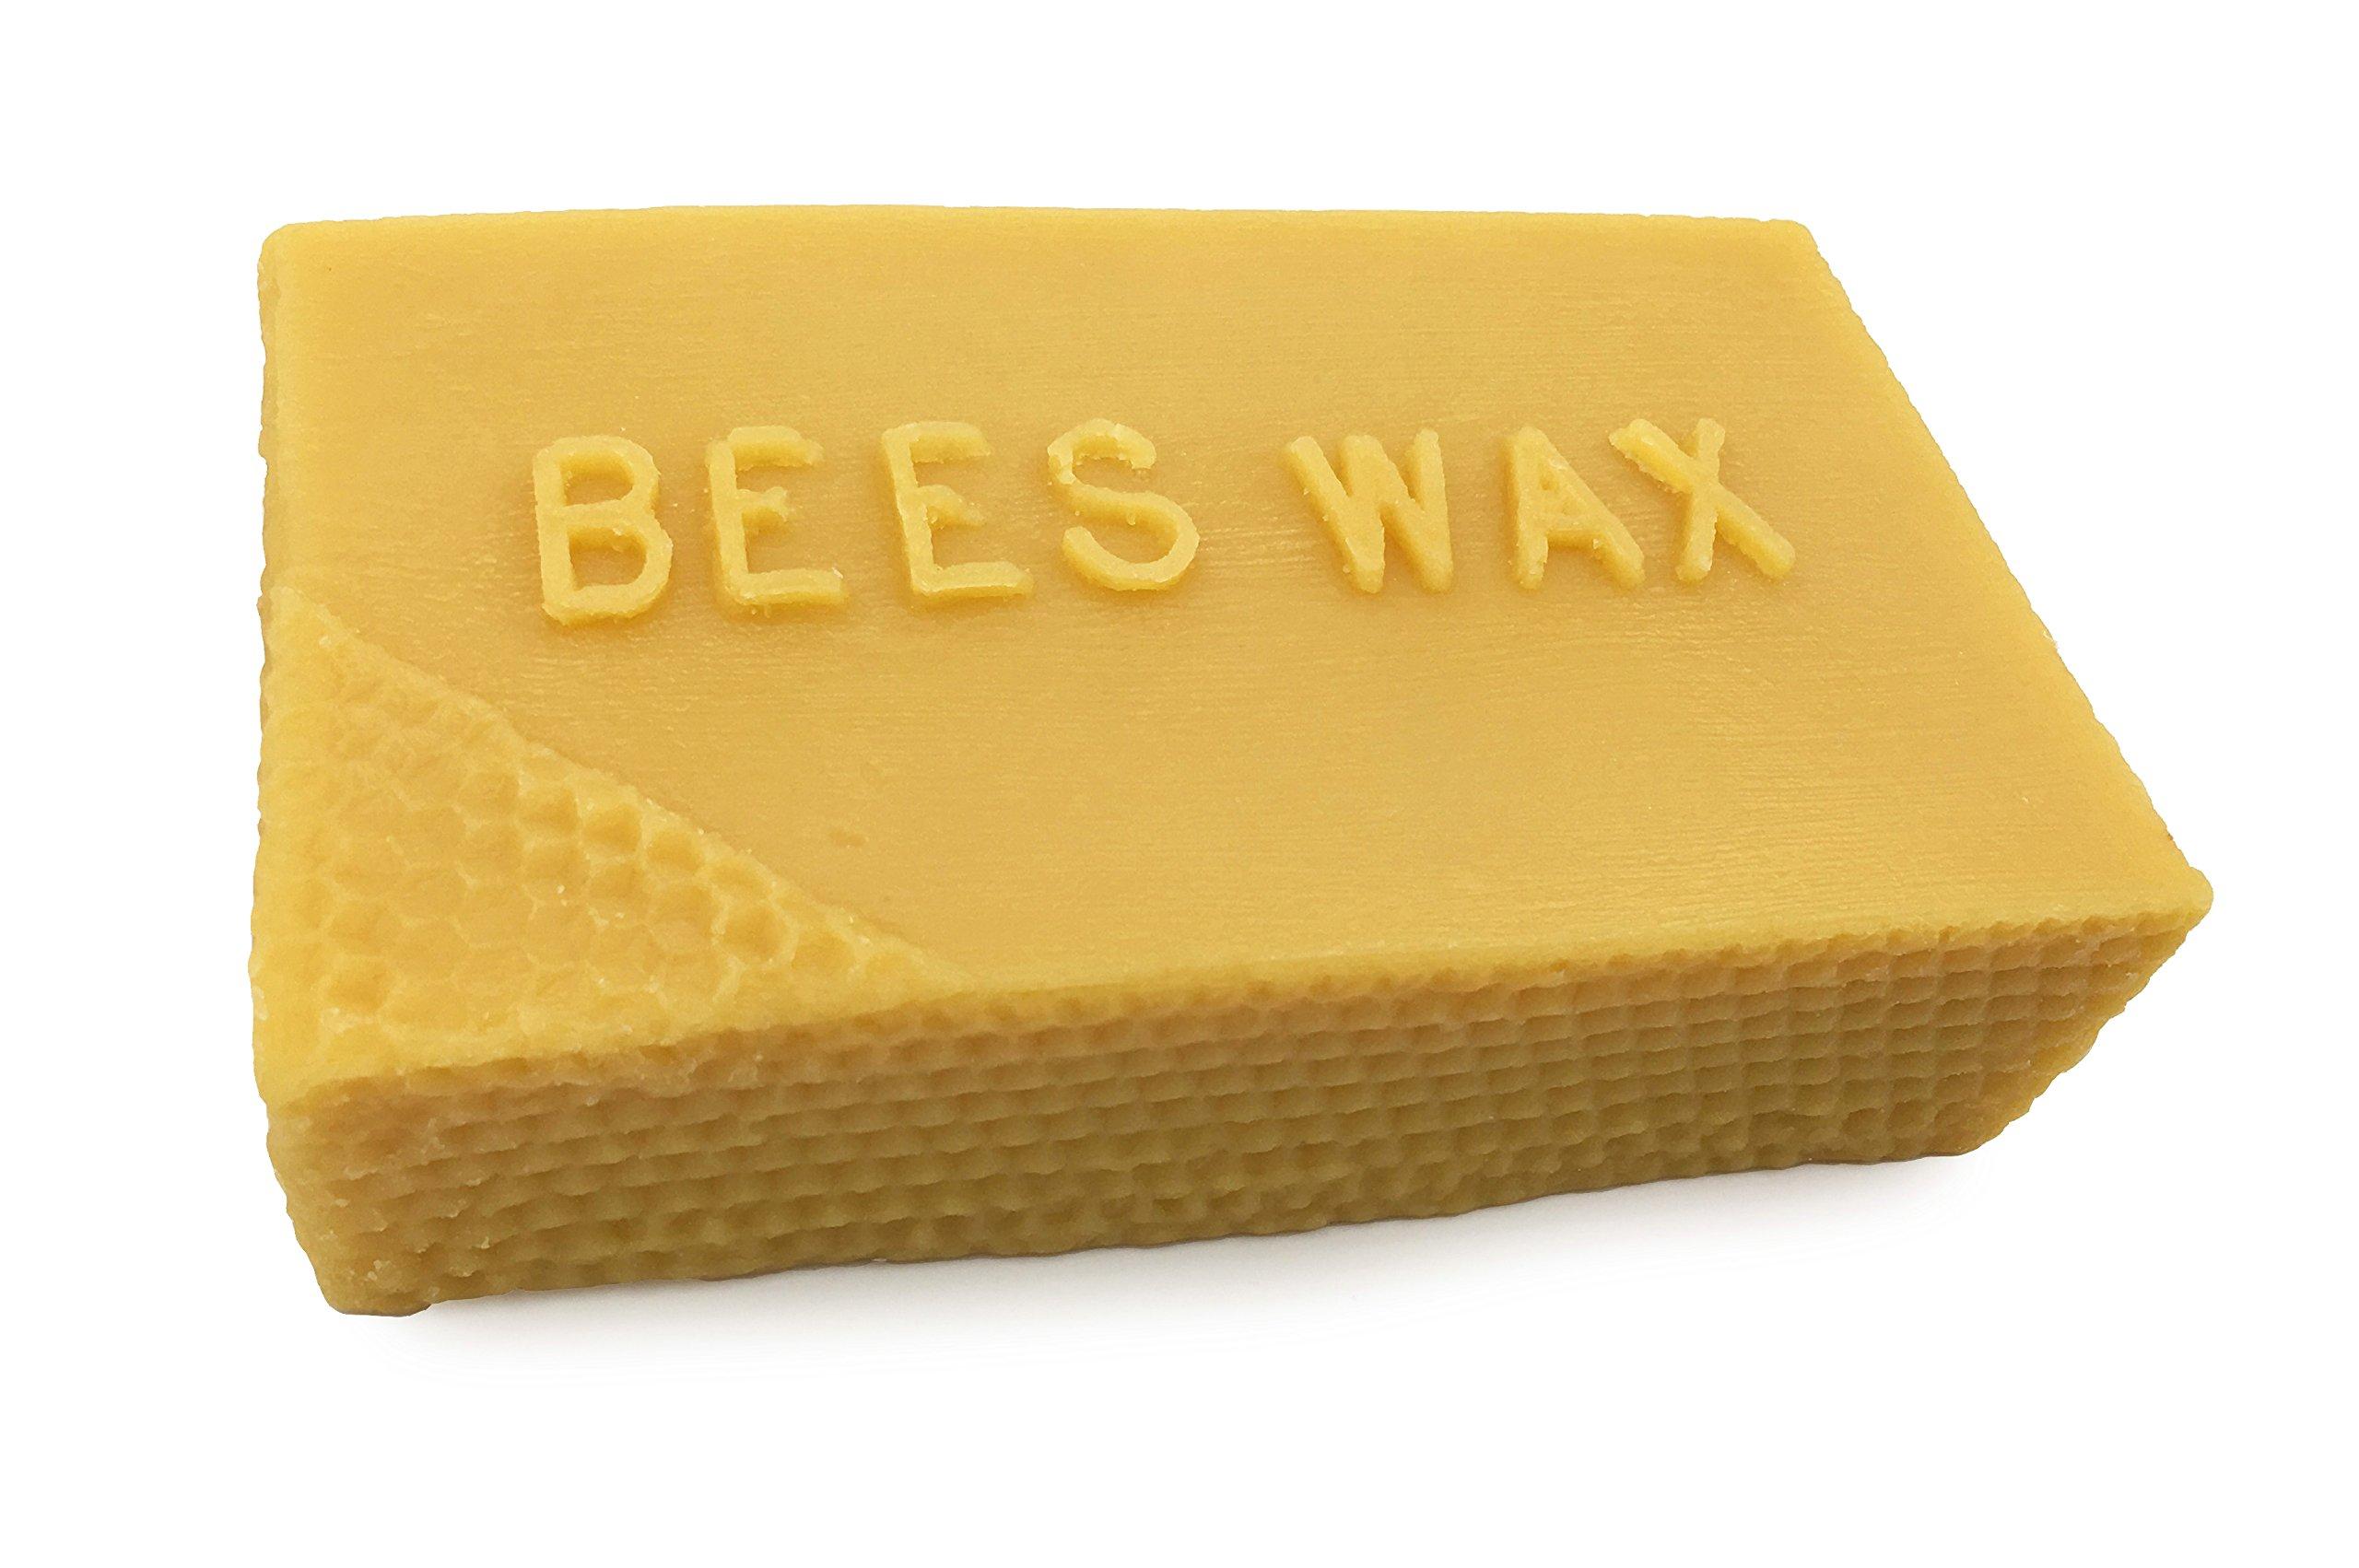 20 Ounces Premium, Pure All Natural Beeswax Bar. Alternative Imagination Brand